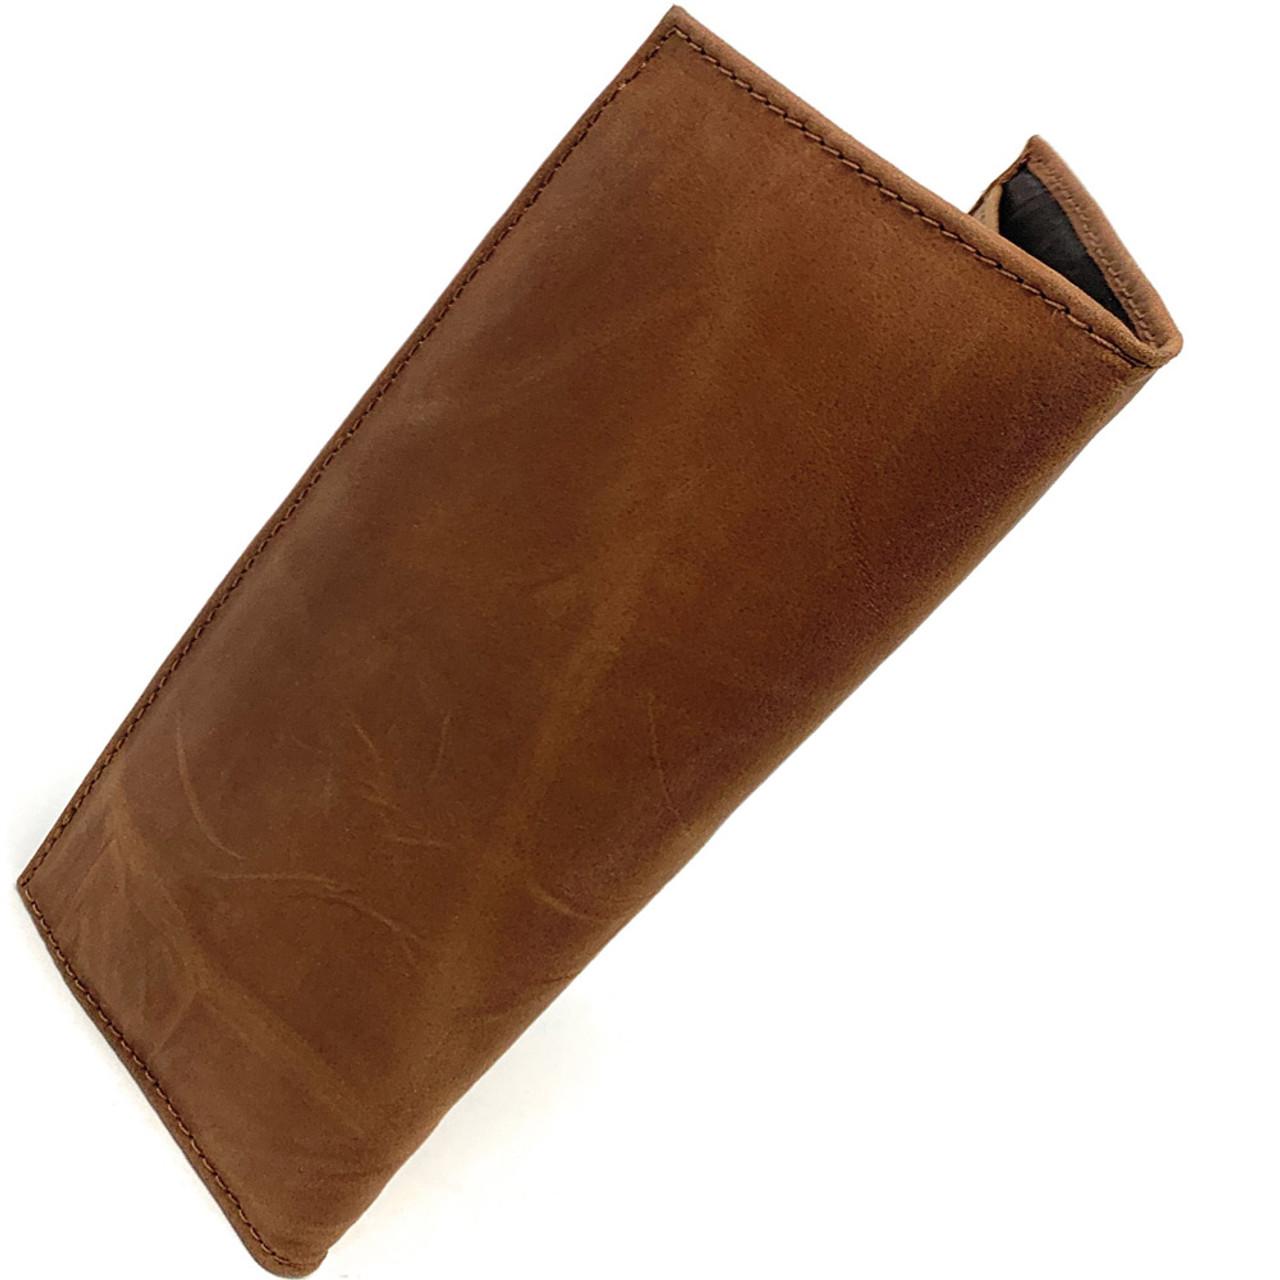 Purdue University Leather Wallet Brown Checkbook Wallet